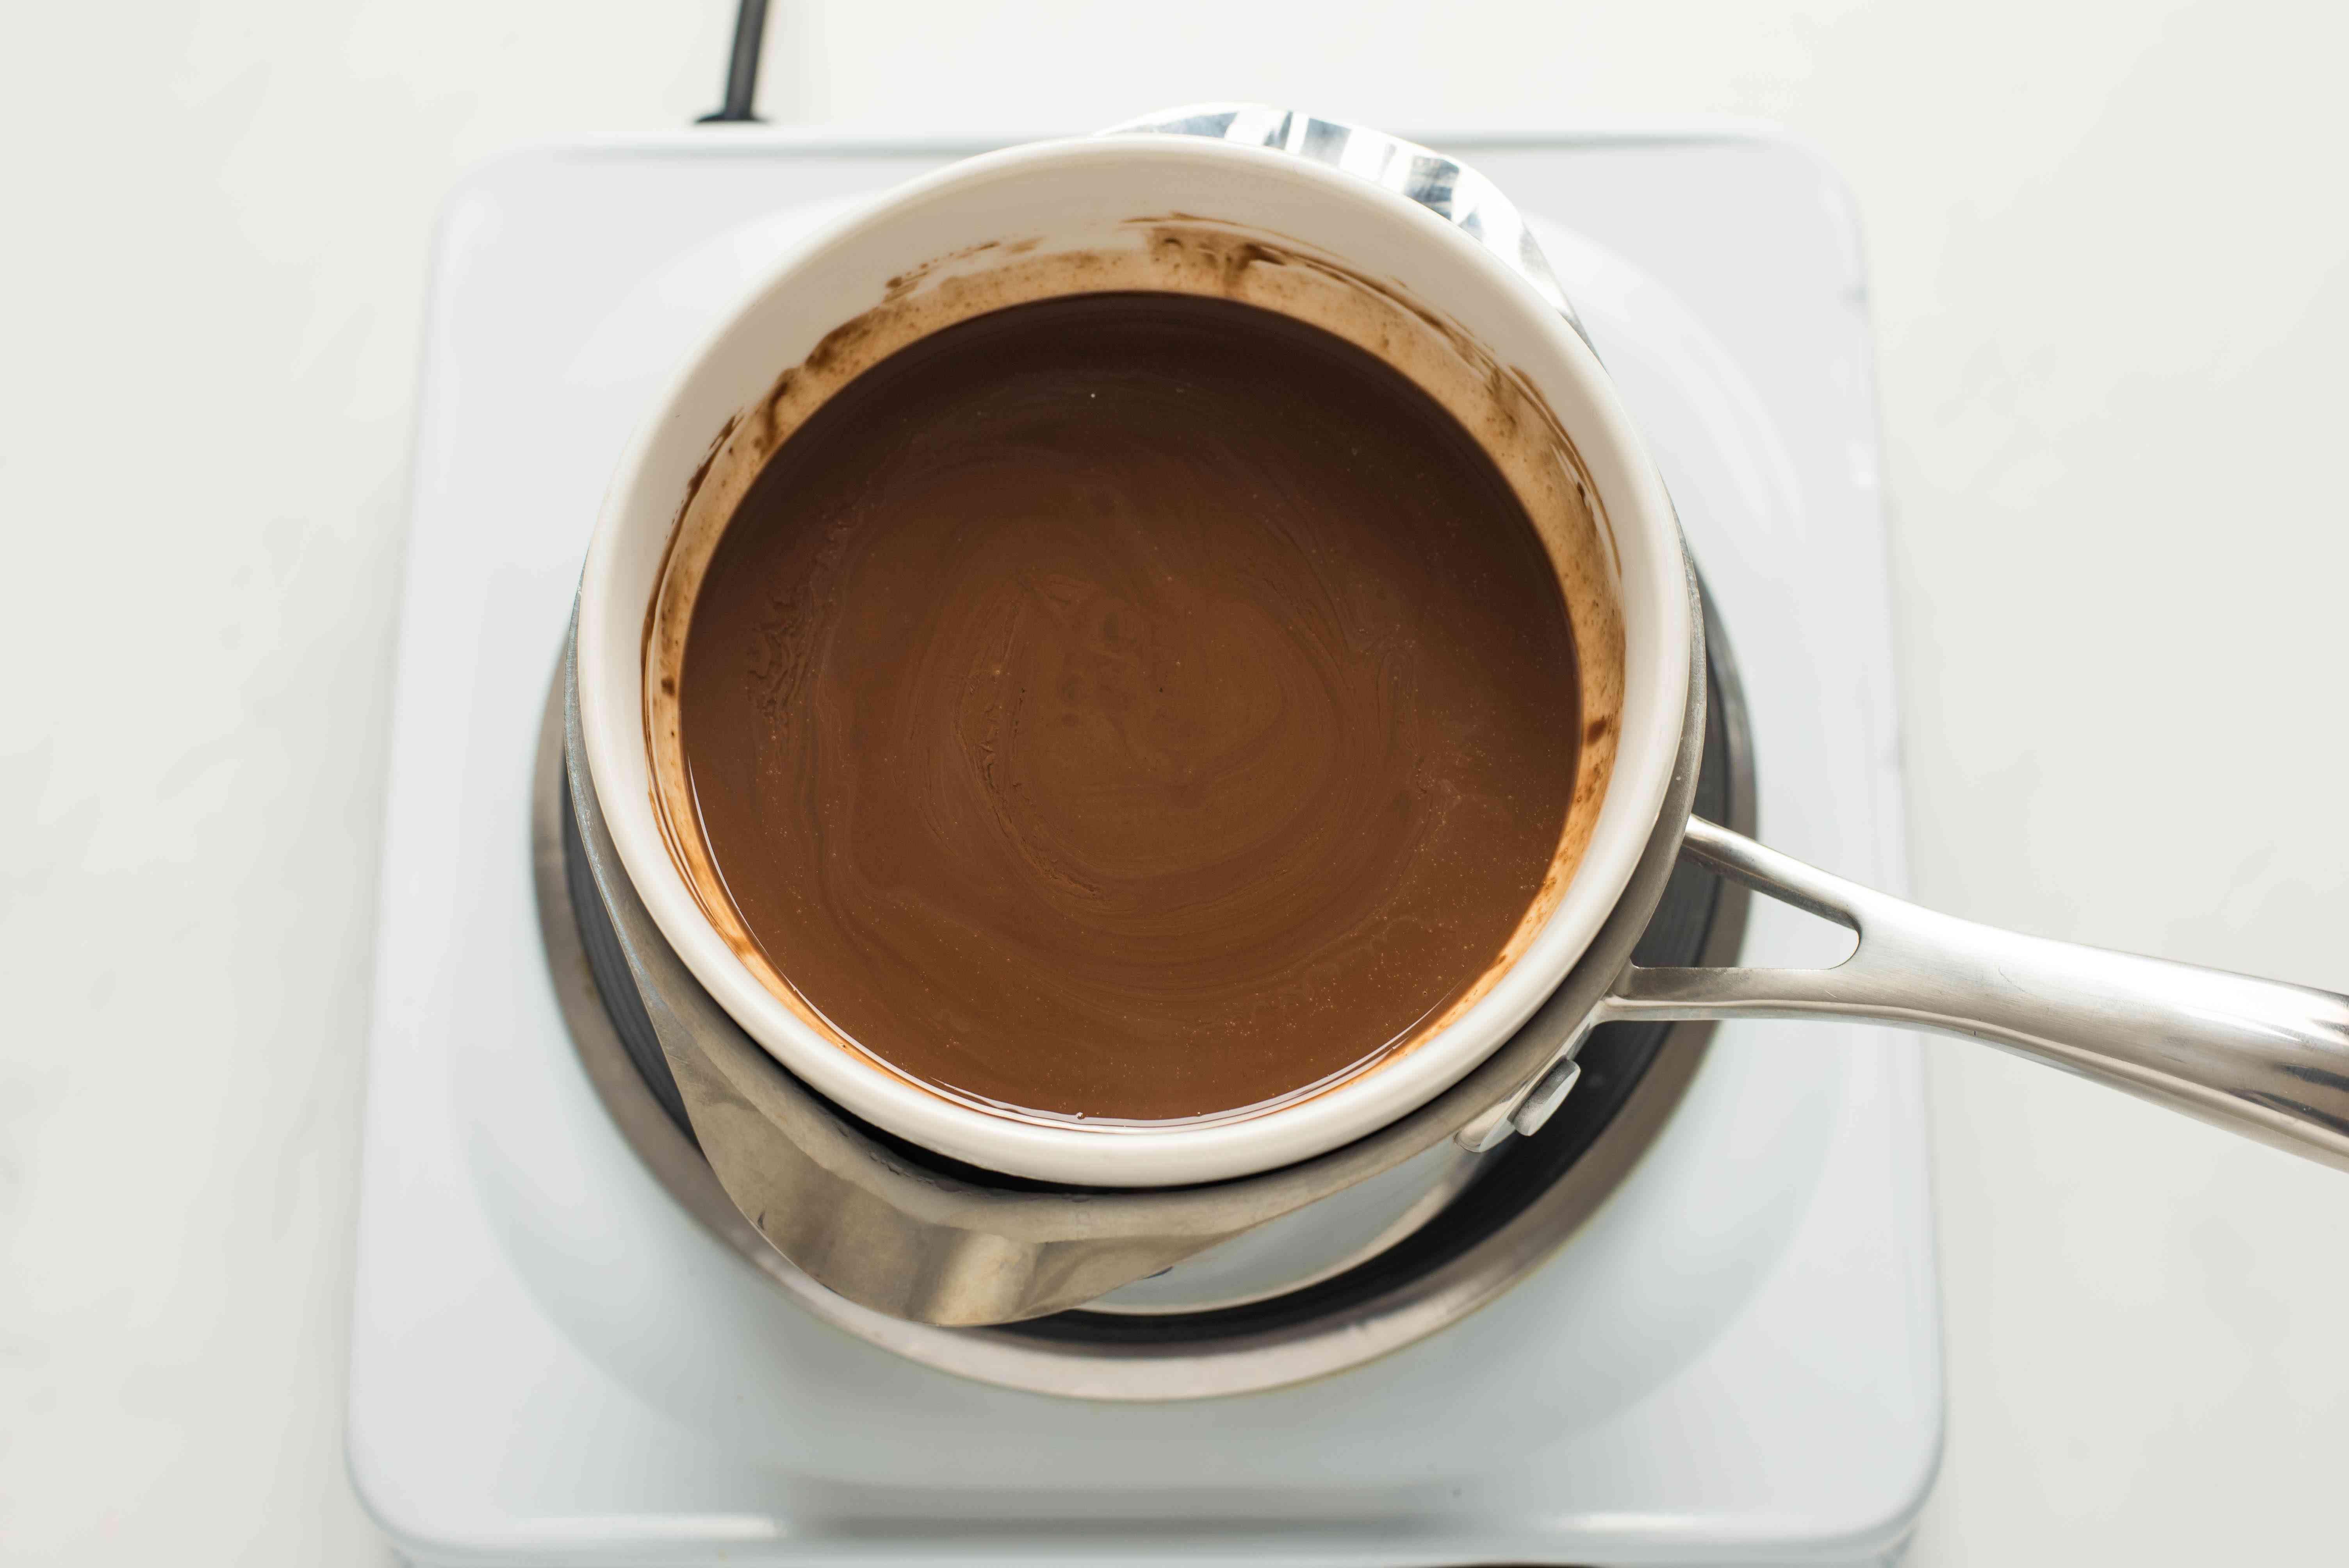 Gently melt chocolate